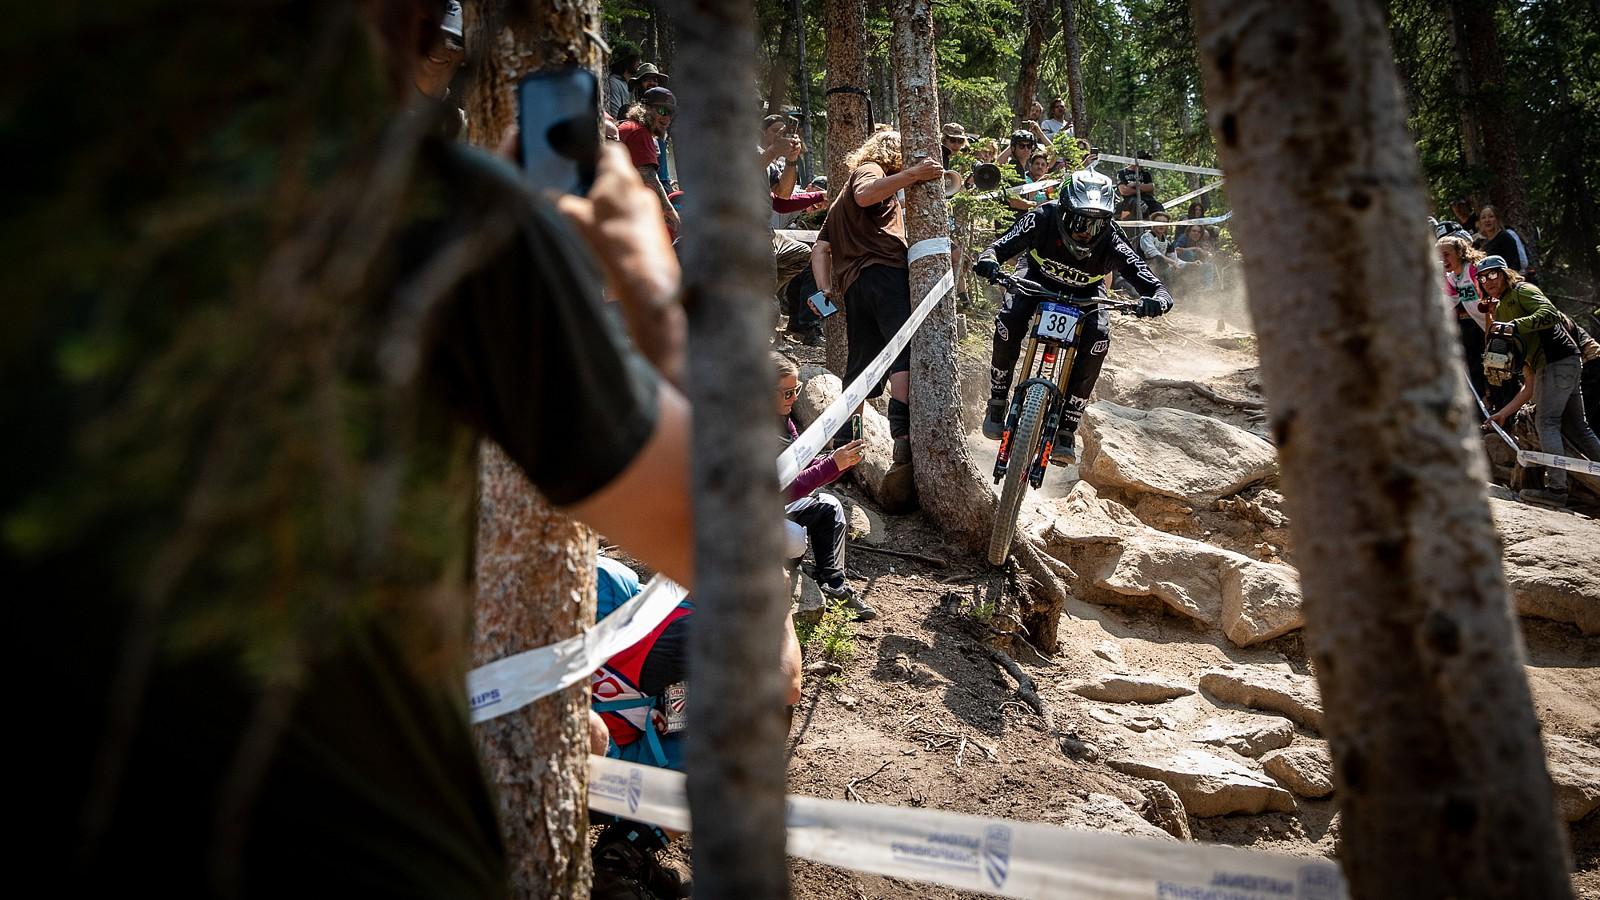 Luca Shaw - US National Champs Downhill Photo Blast - Mountain Biking Pictures - Vital MTB